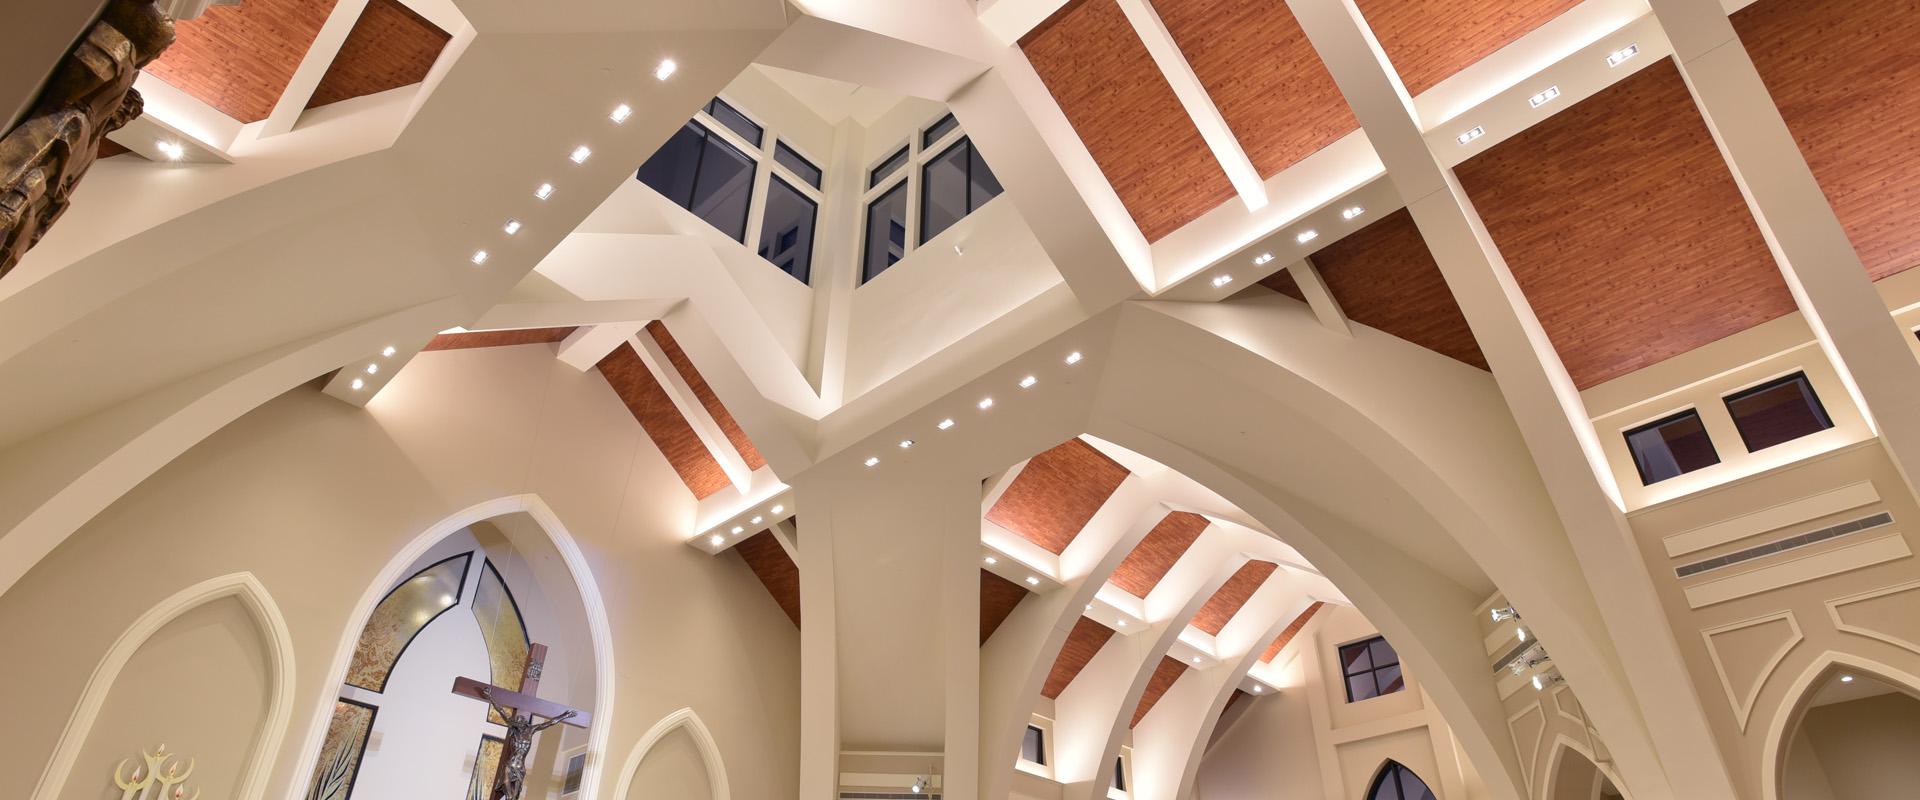 Holy Vietnamese Martyrs Catholic Church - Sanctuary Ceiling